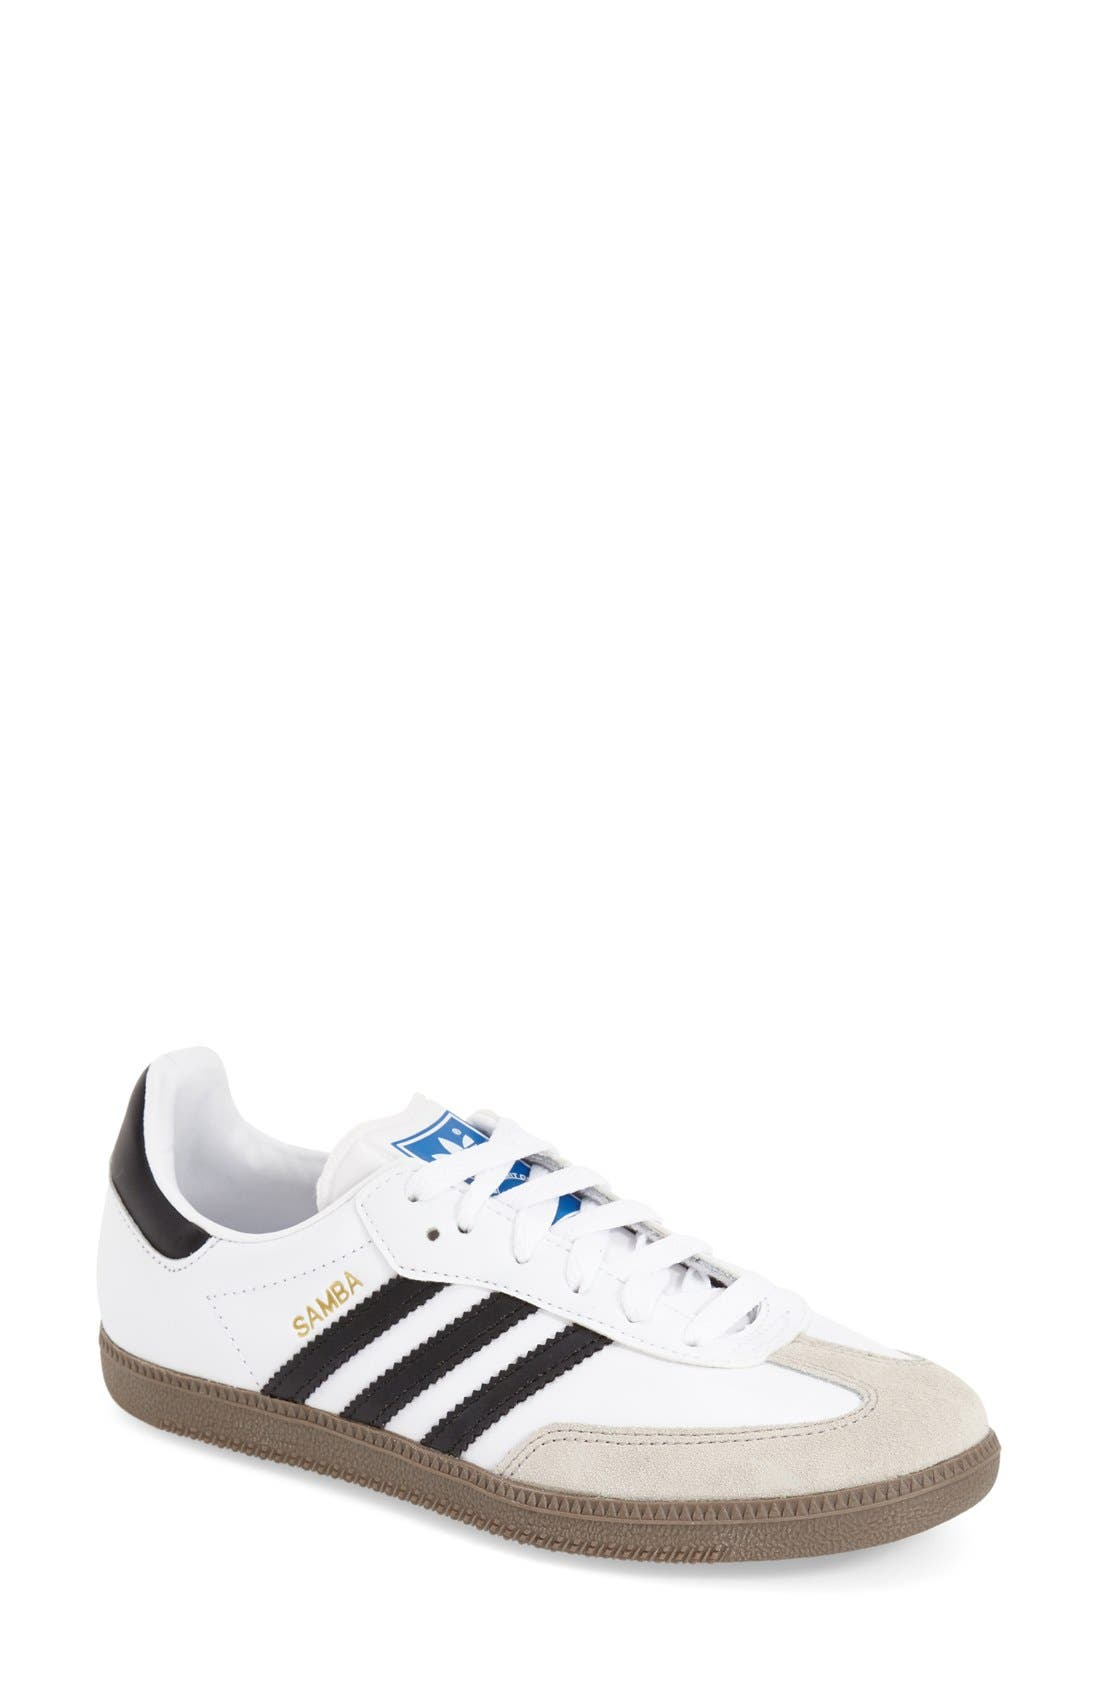 Main Image - adidas 'Samba' Sneaker (Women)